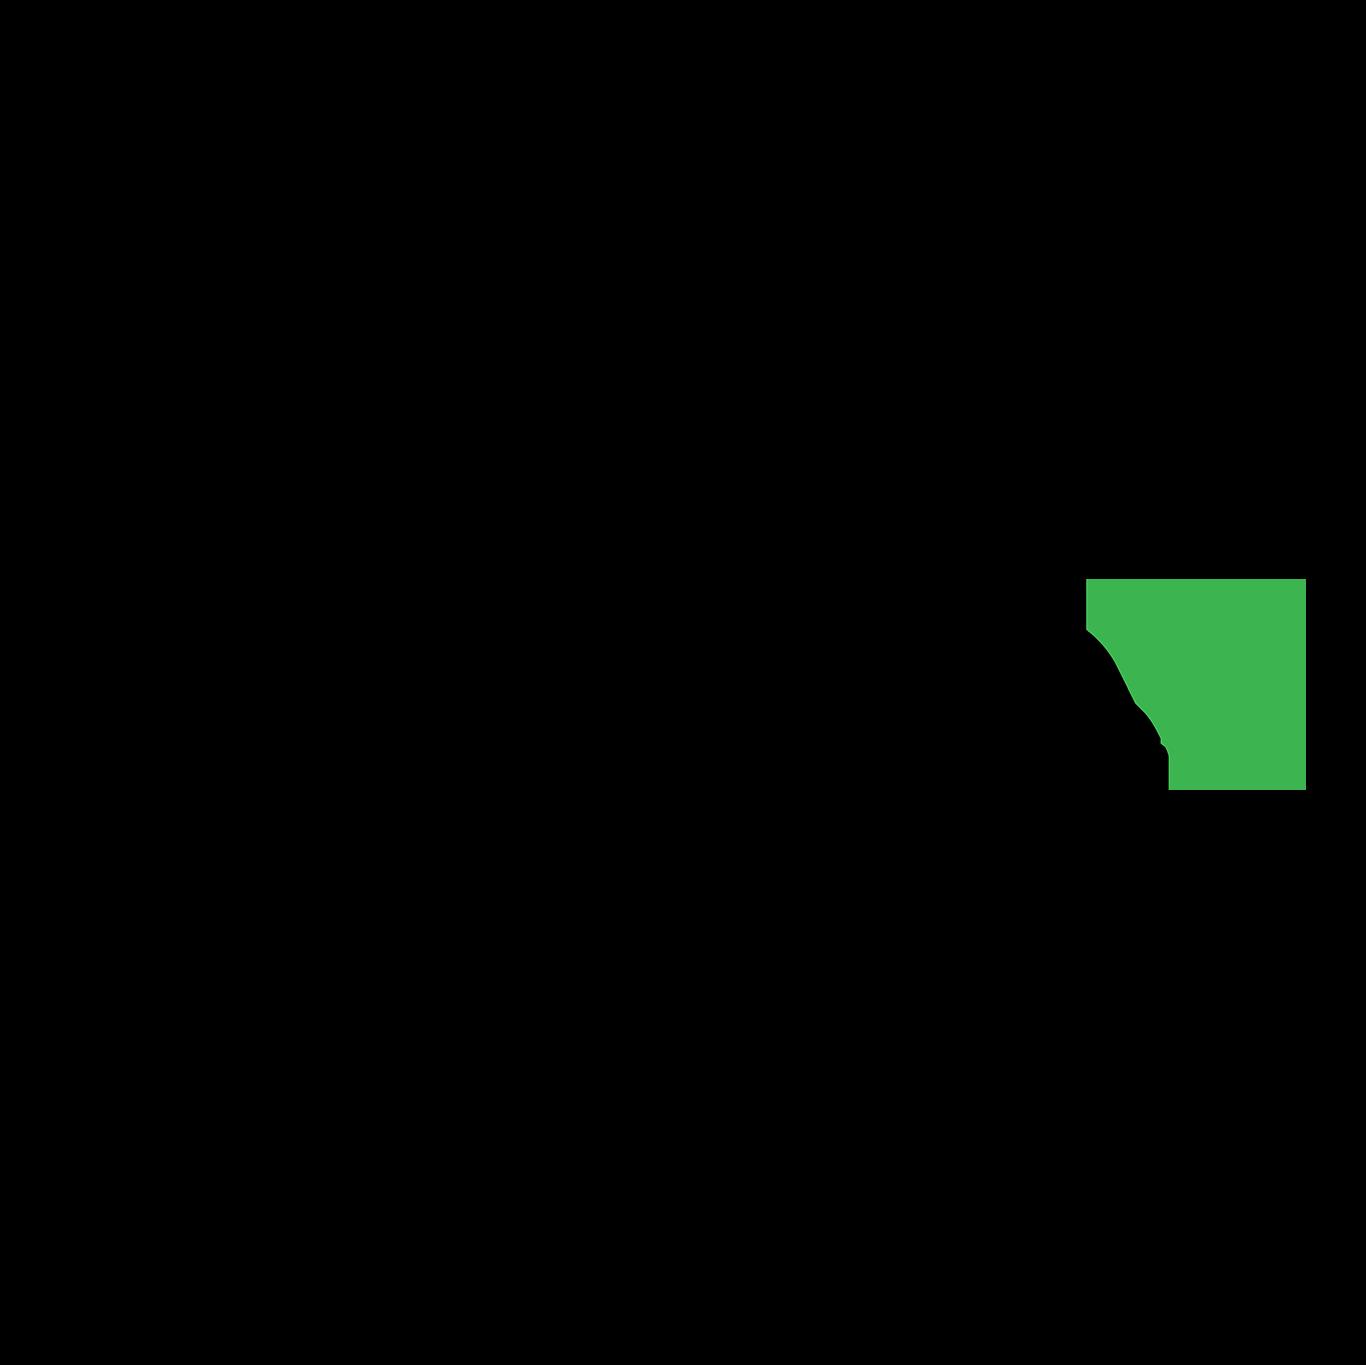 Bright Day Graphene logo